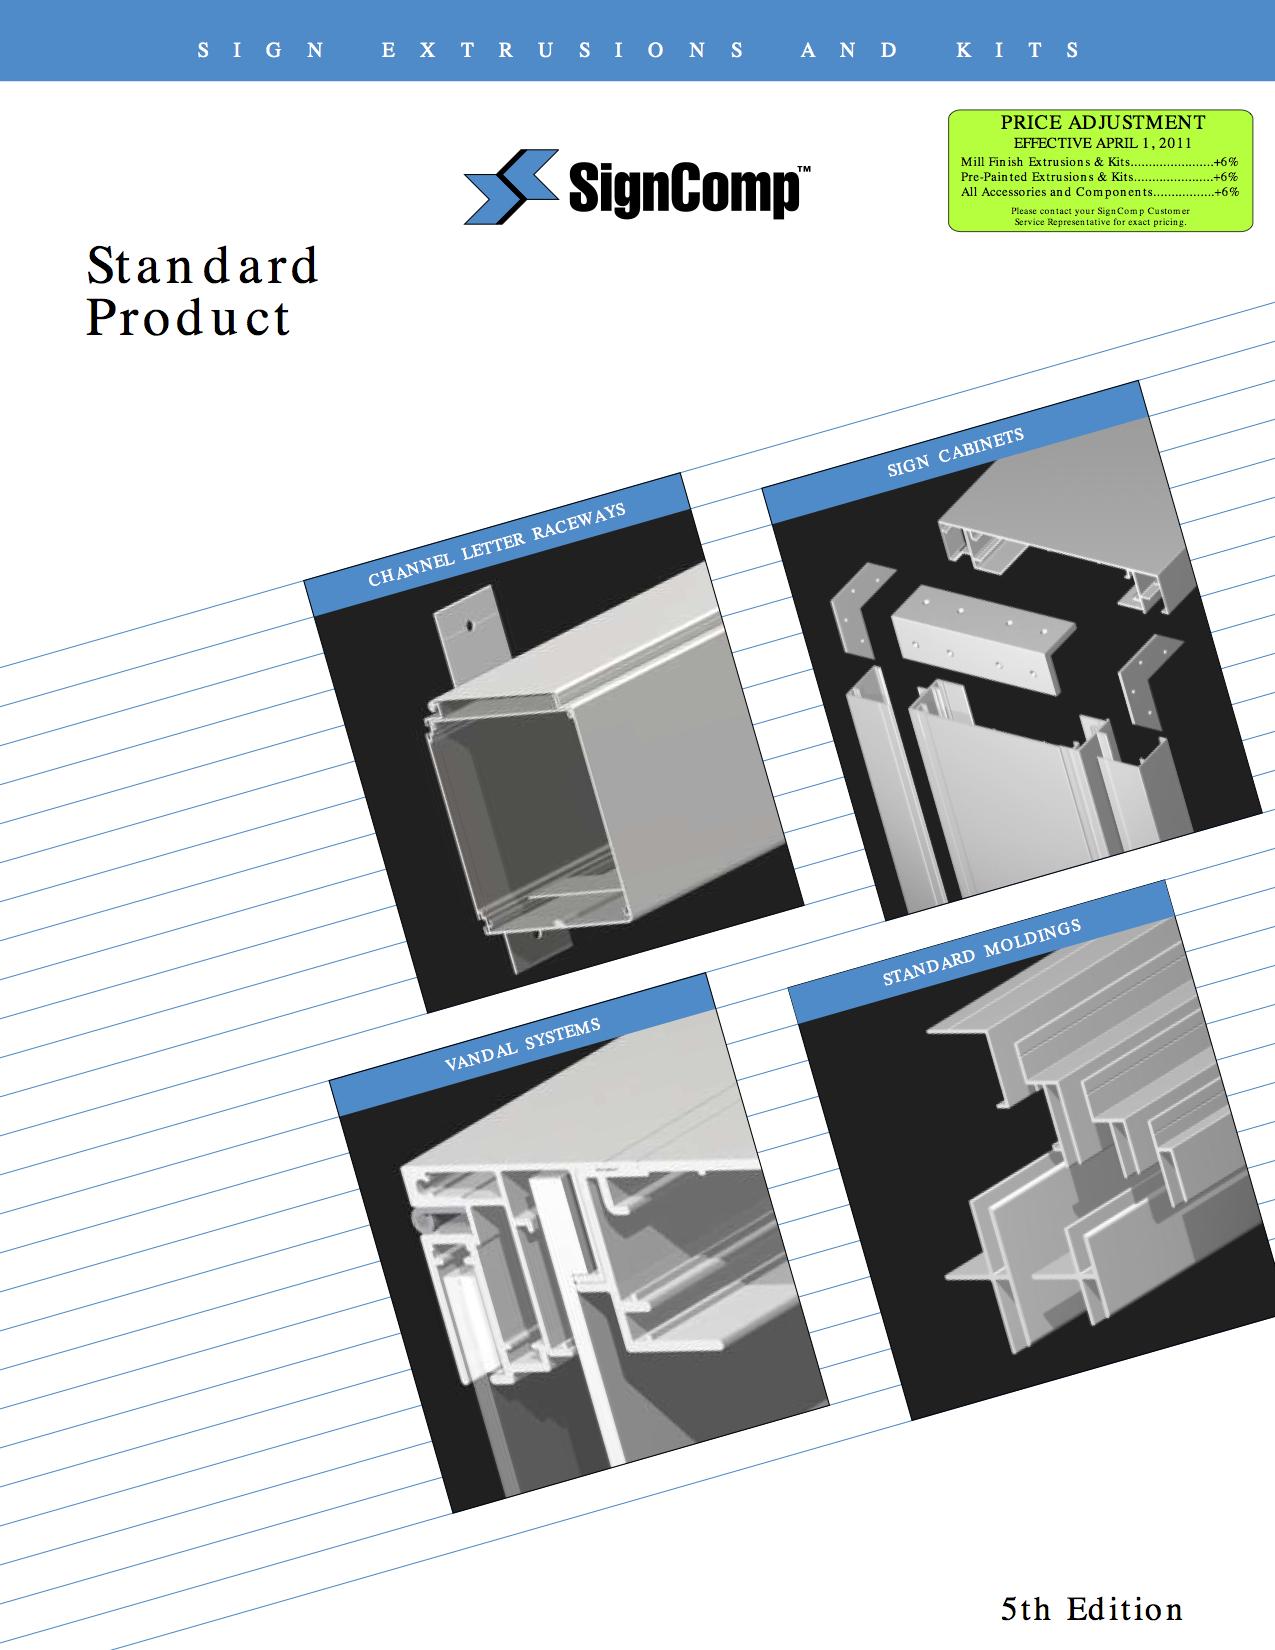 180349-540268.standard-5th-edition.jpg